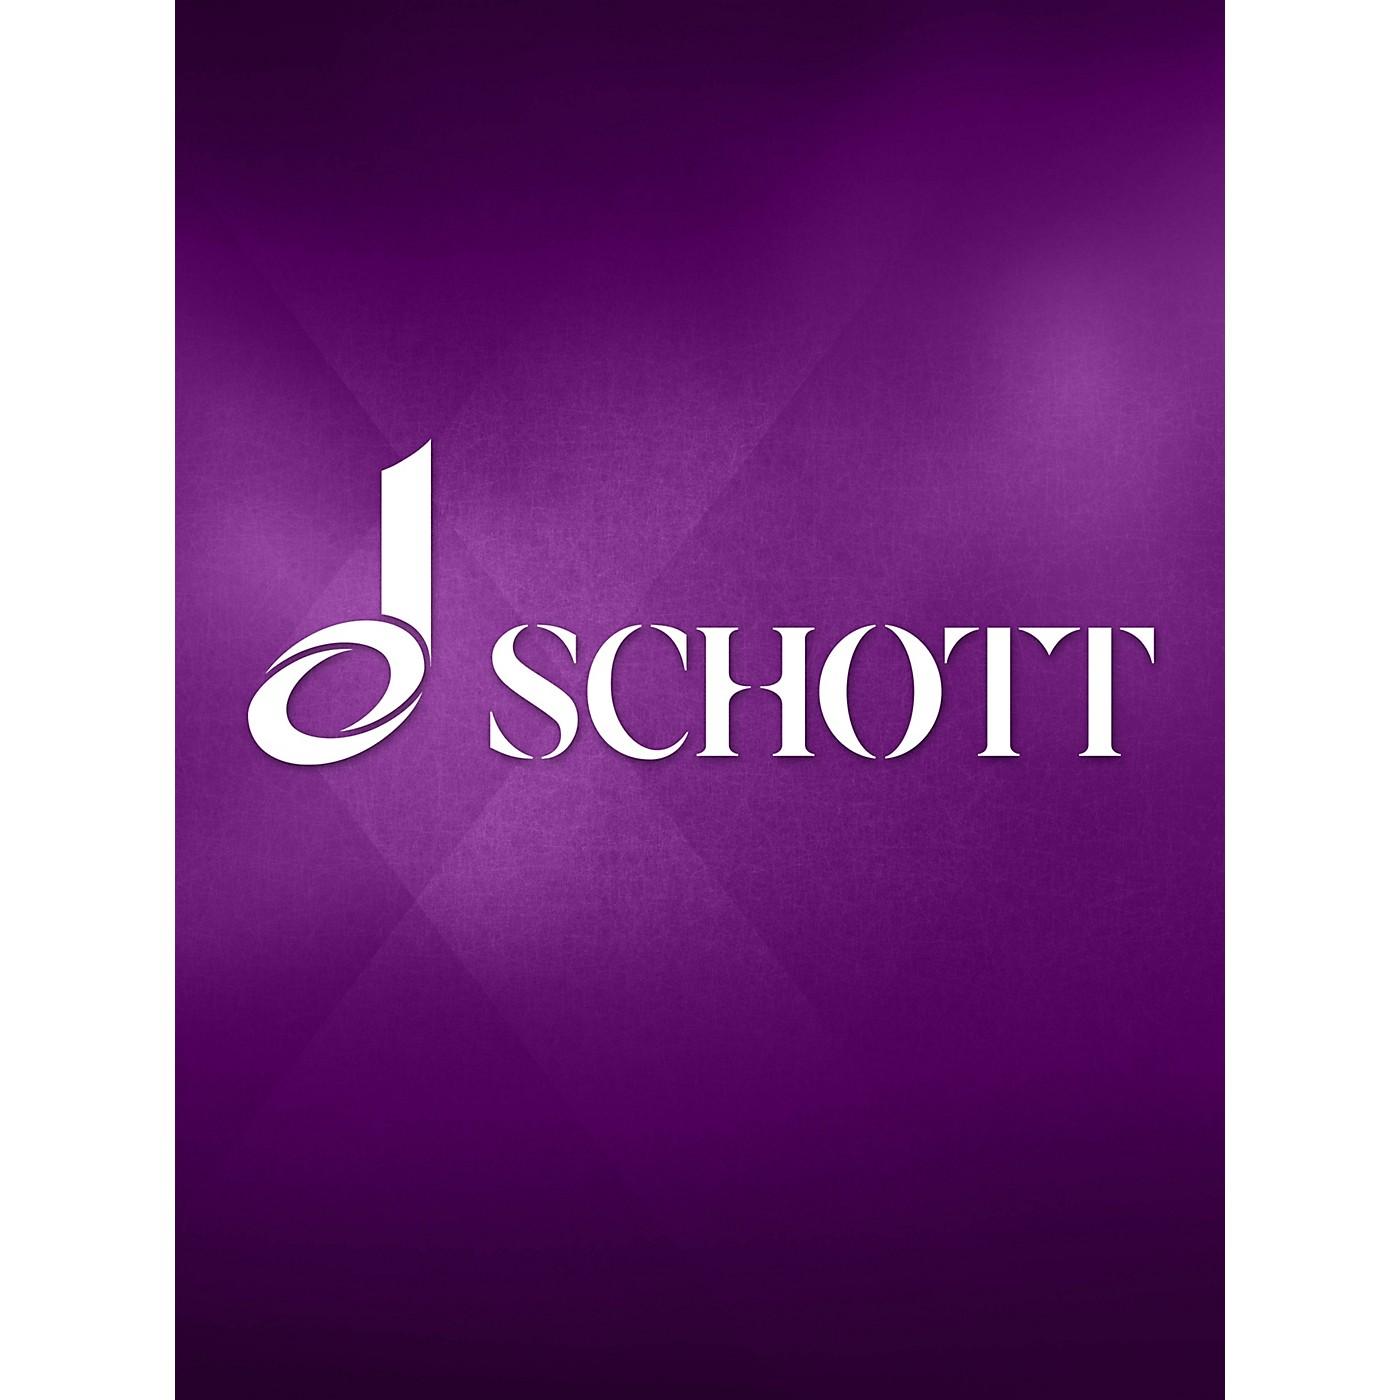 Eulenburg Concerto Grosso in C Major Op. 3, No. 12 (Solo Violin II Part) Schott Series by Francesco Manfredini thumbnail